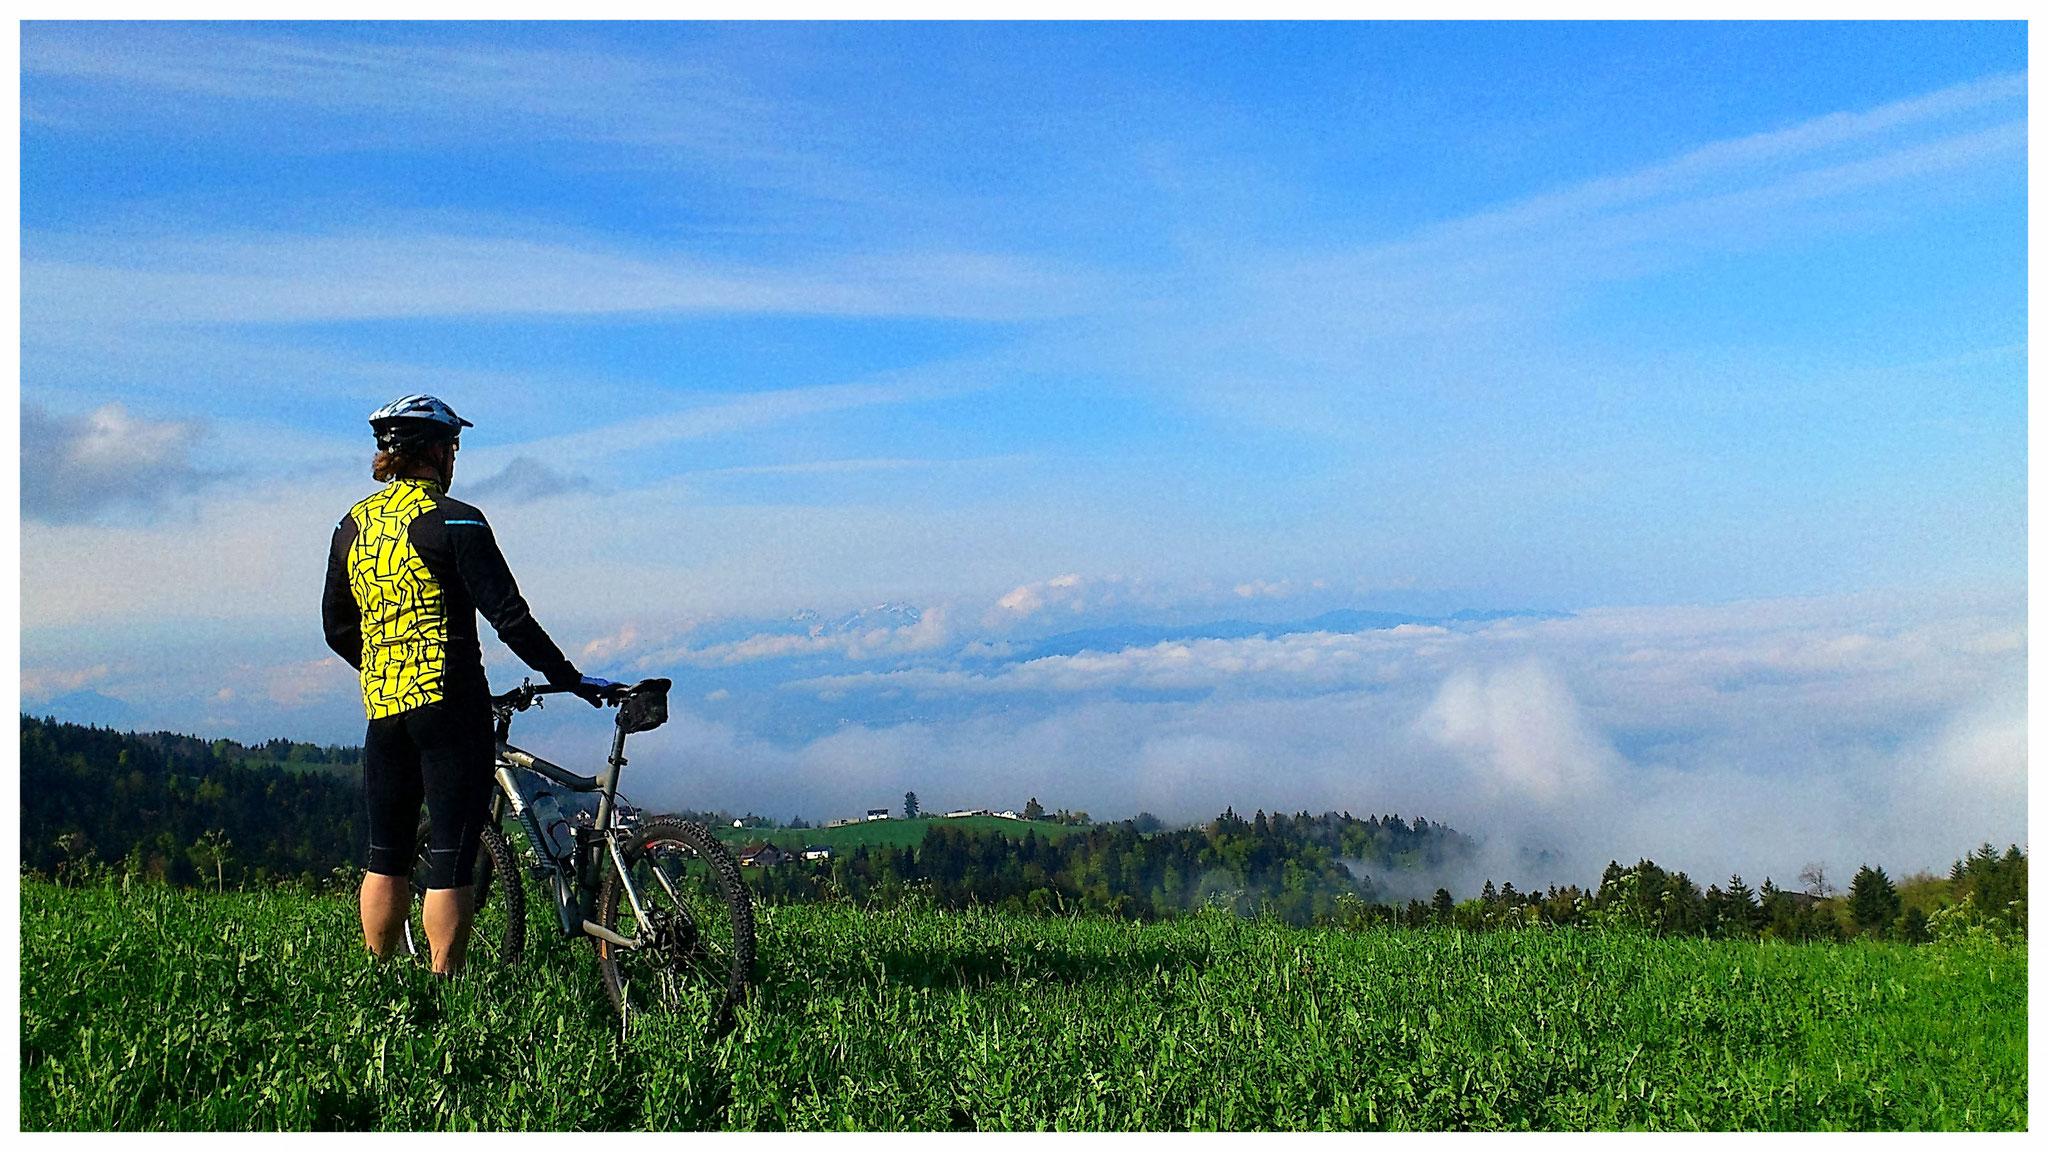 Radtour durchs Allgäu